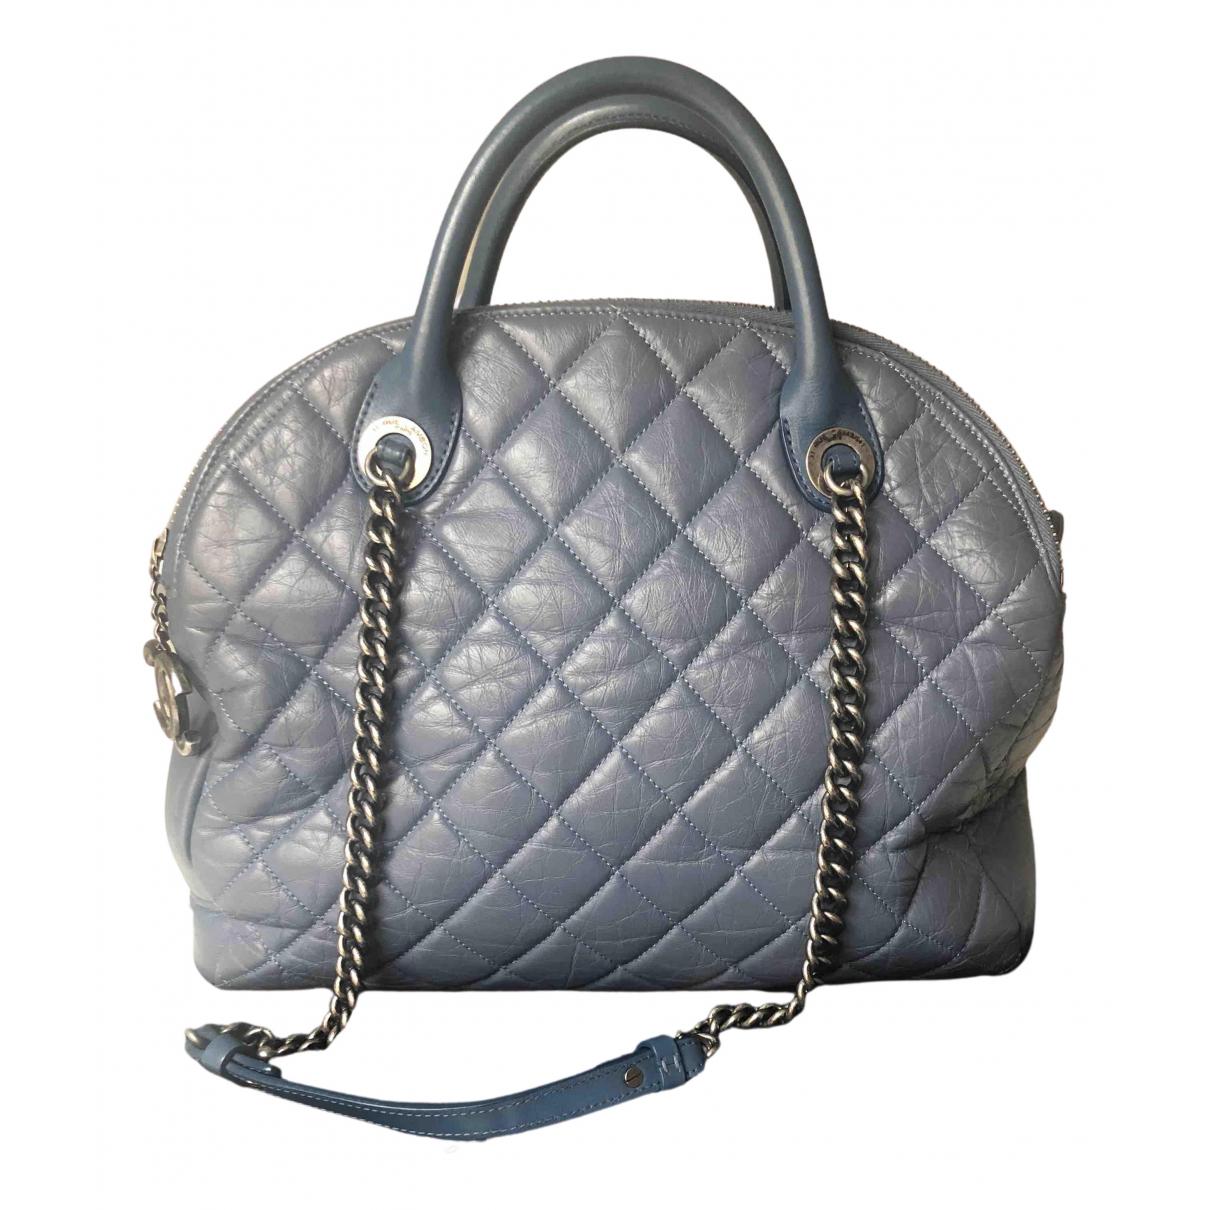 Chanel - Sac a main   pour femme en cuir - bleu